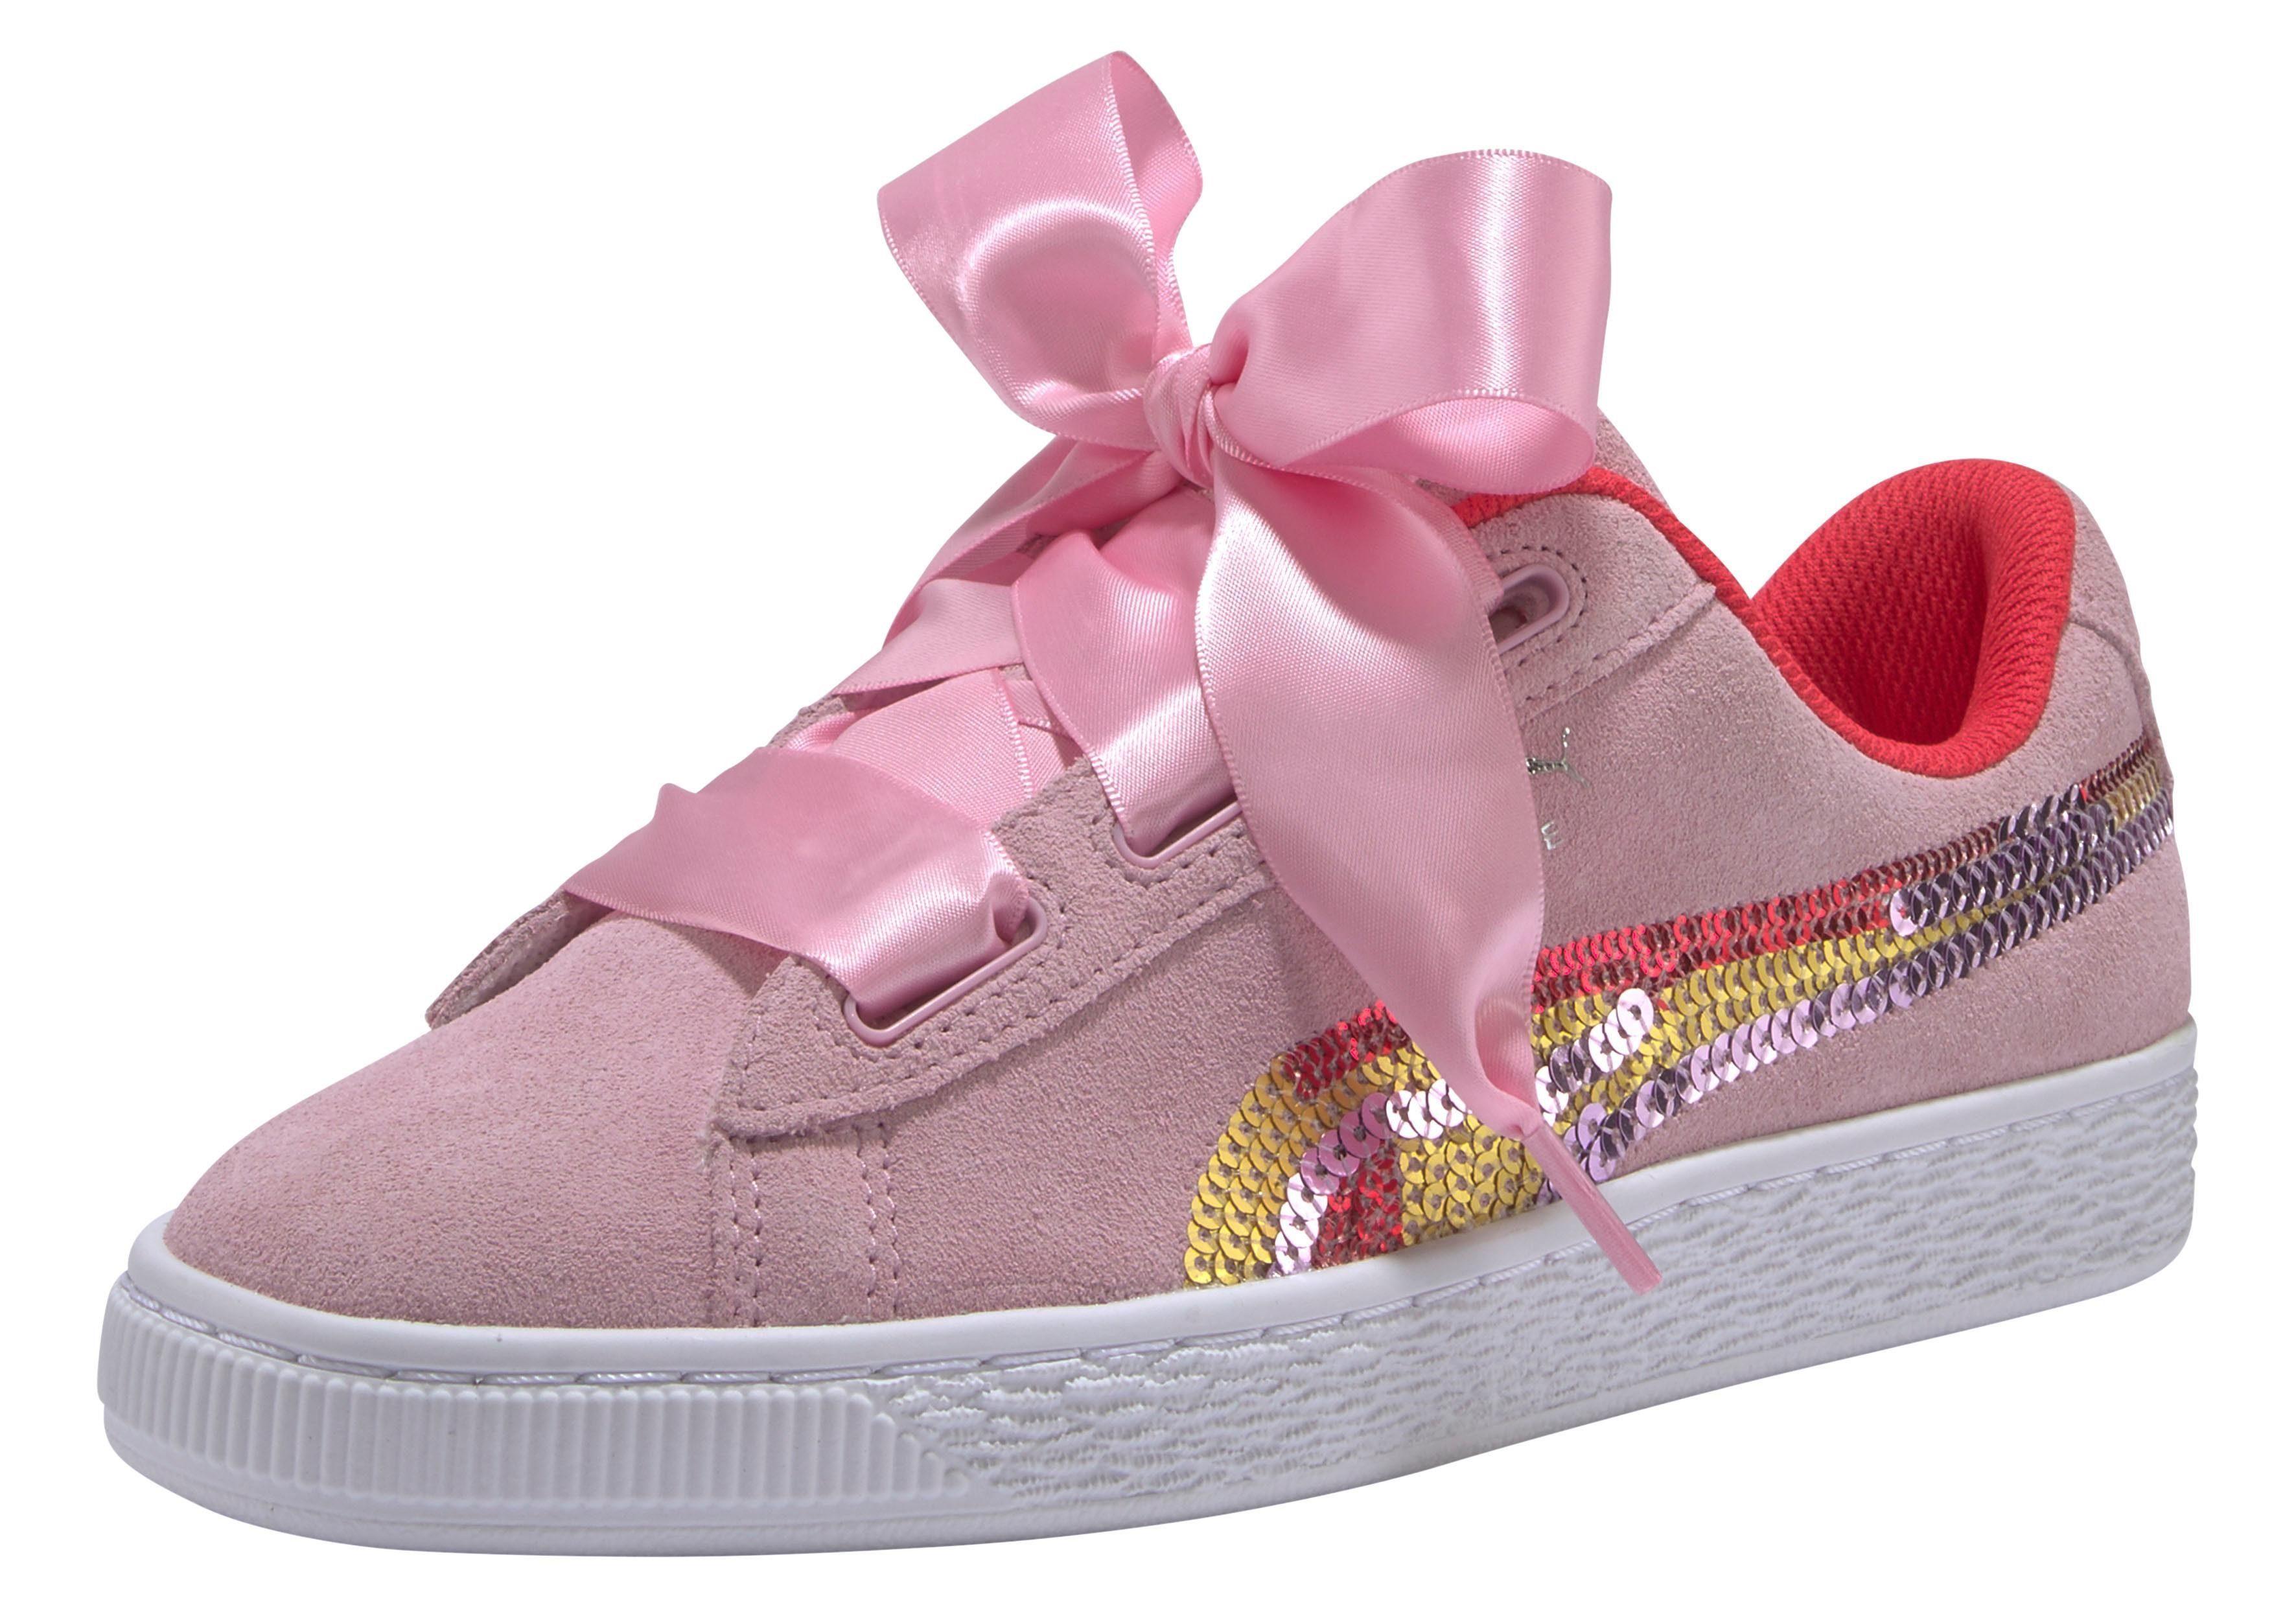 Details zu PUMA Heart Damen Sneaker Freizeit Schleifen Schuhe Sommer Sneakers Schuh neu